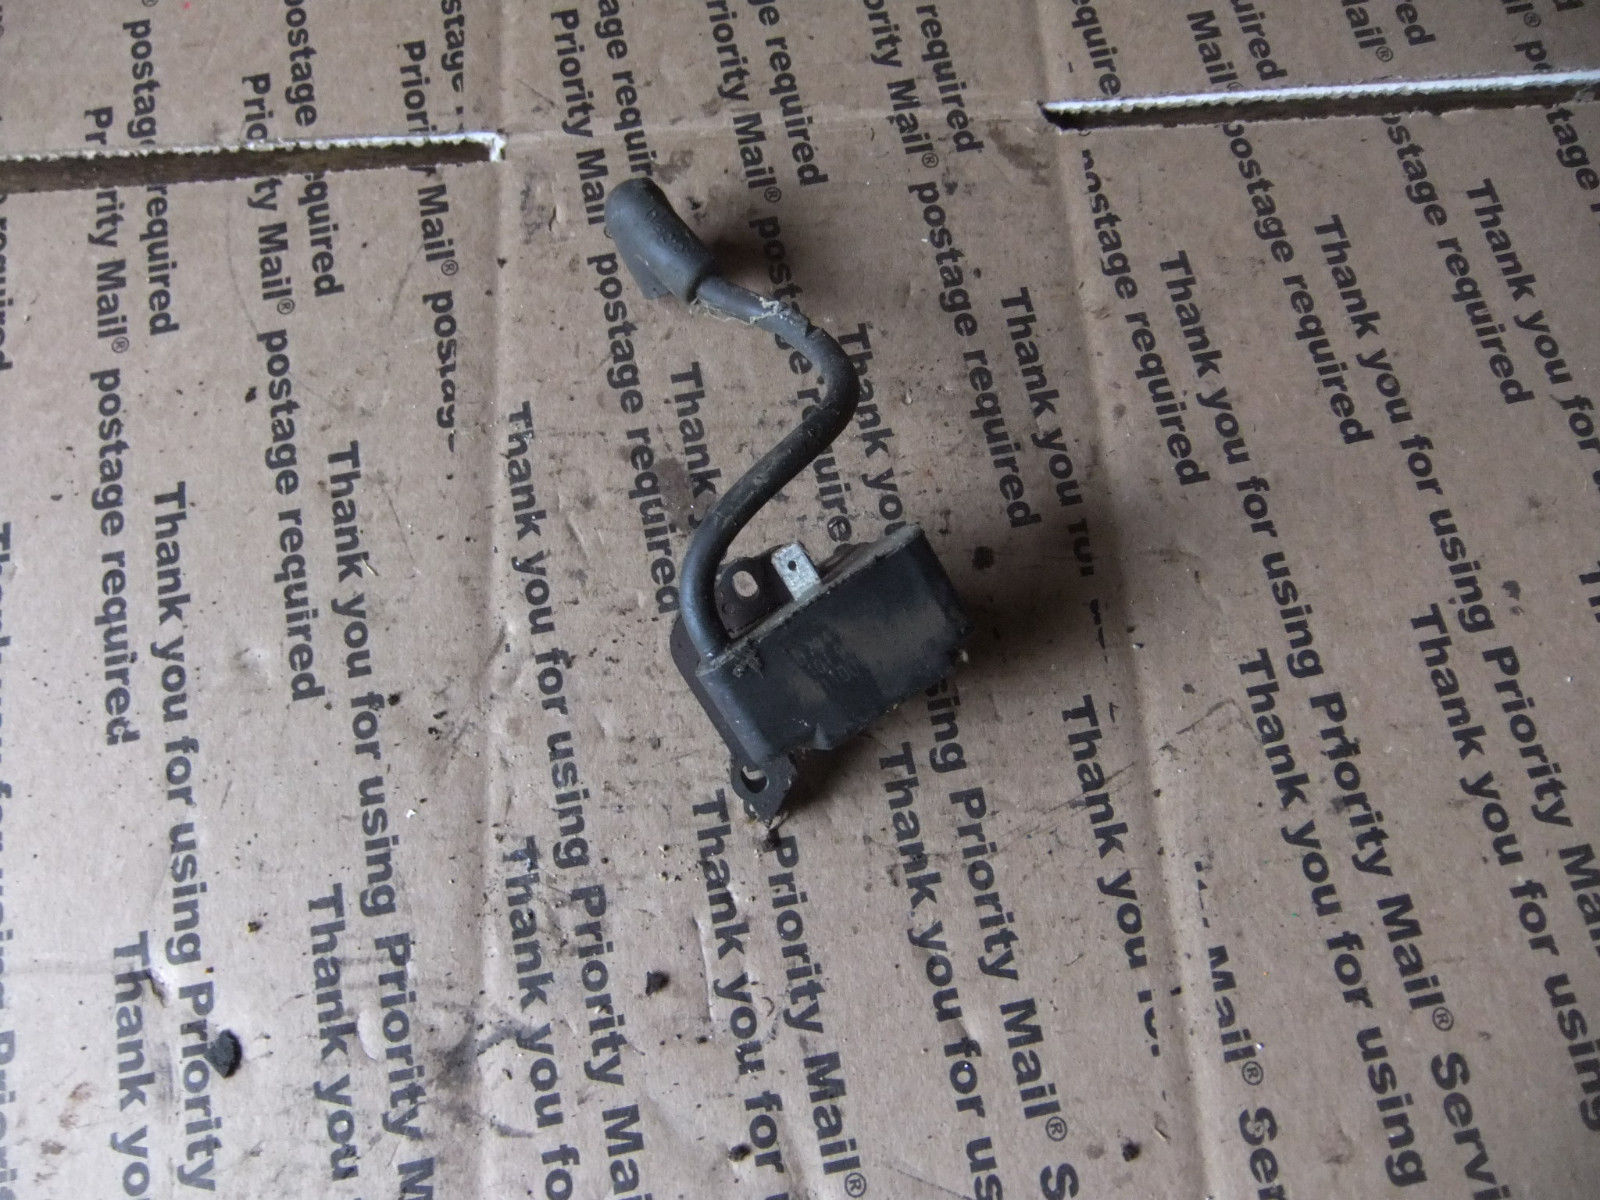 2011 Bolens String Trimmer  25 CC Coil